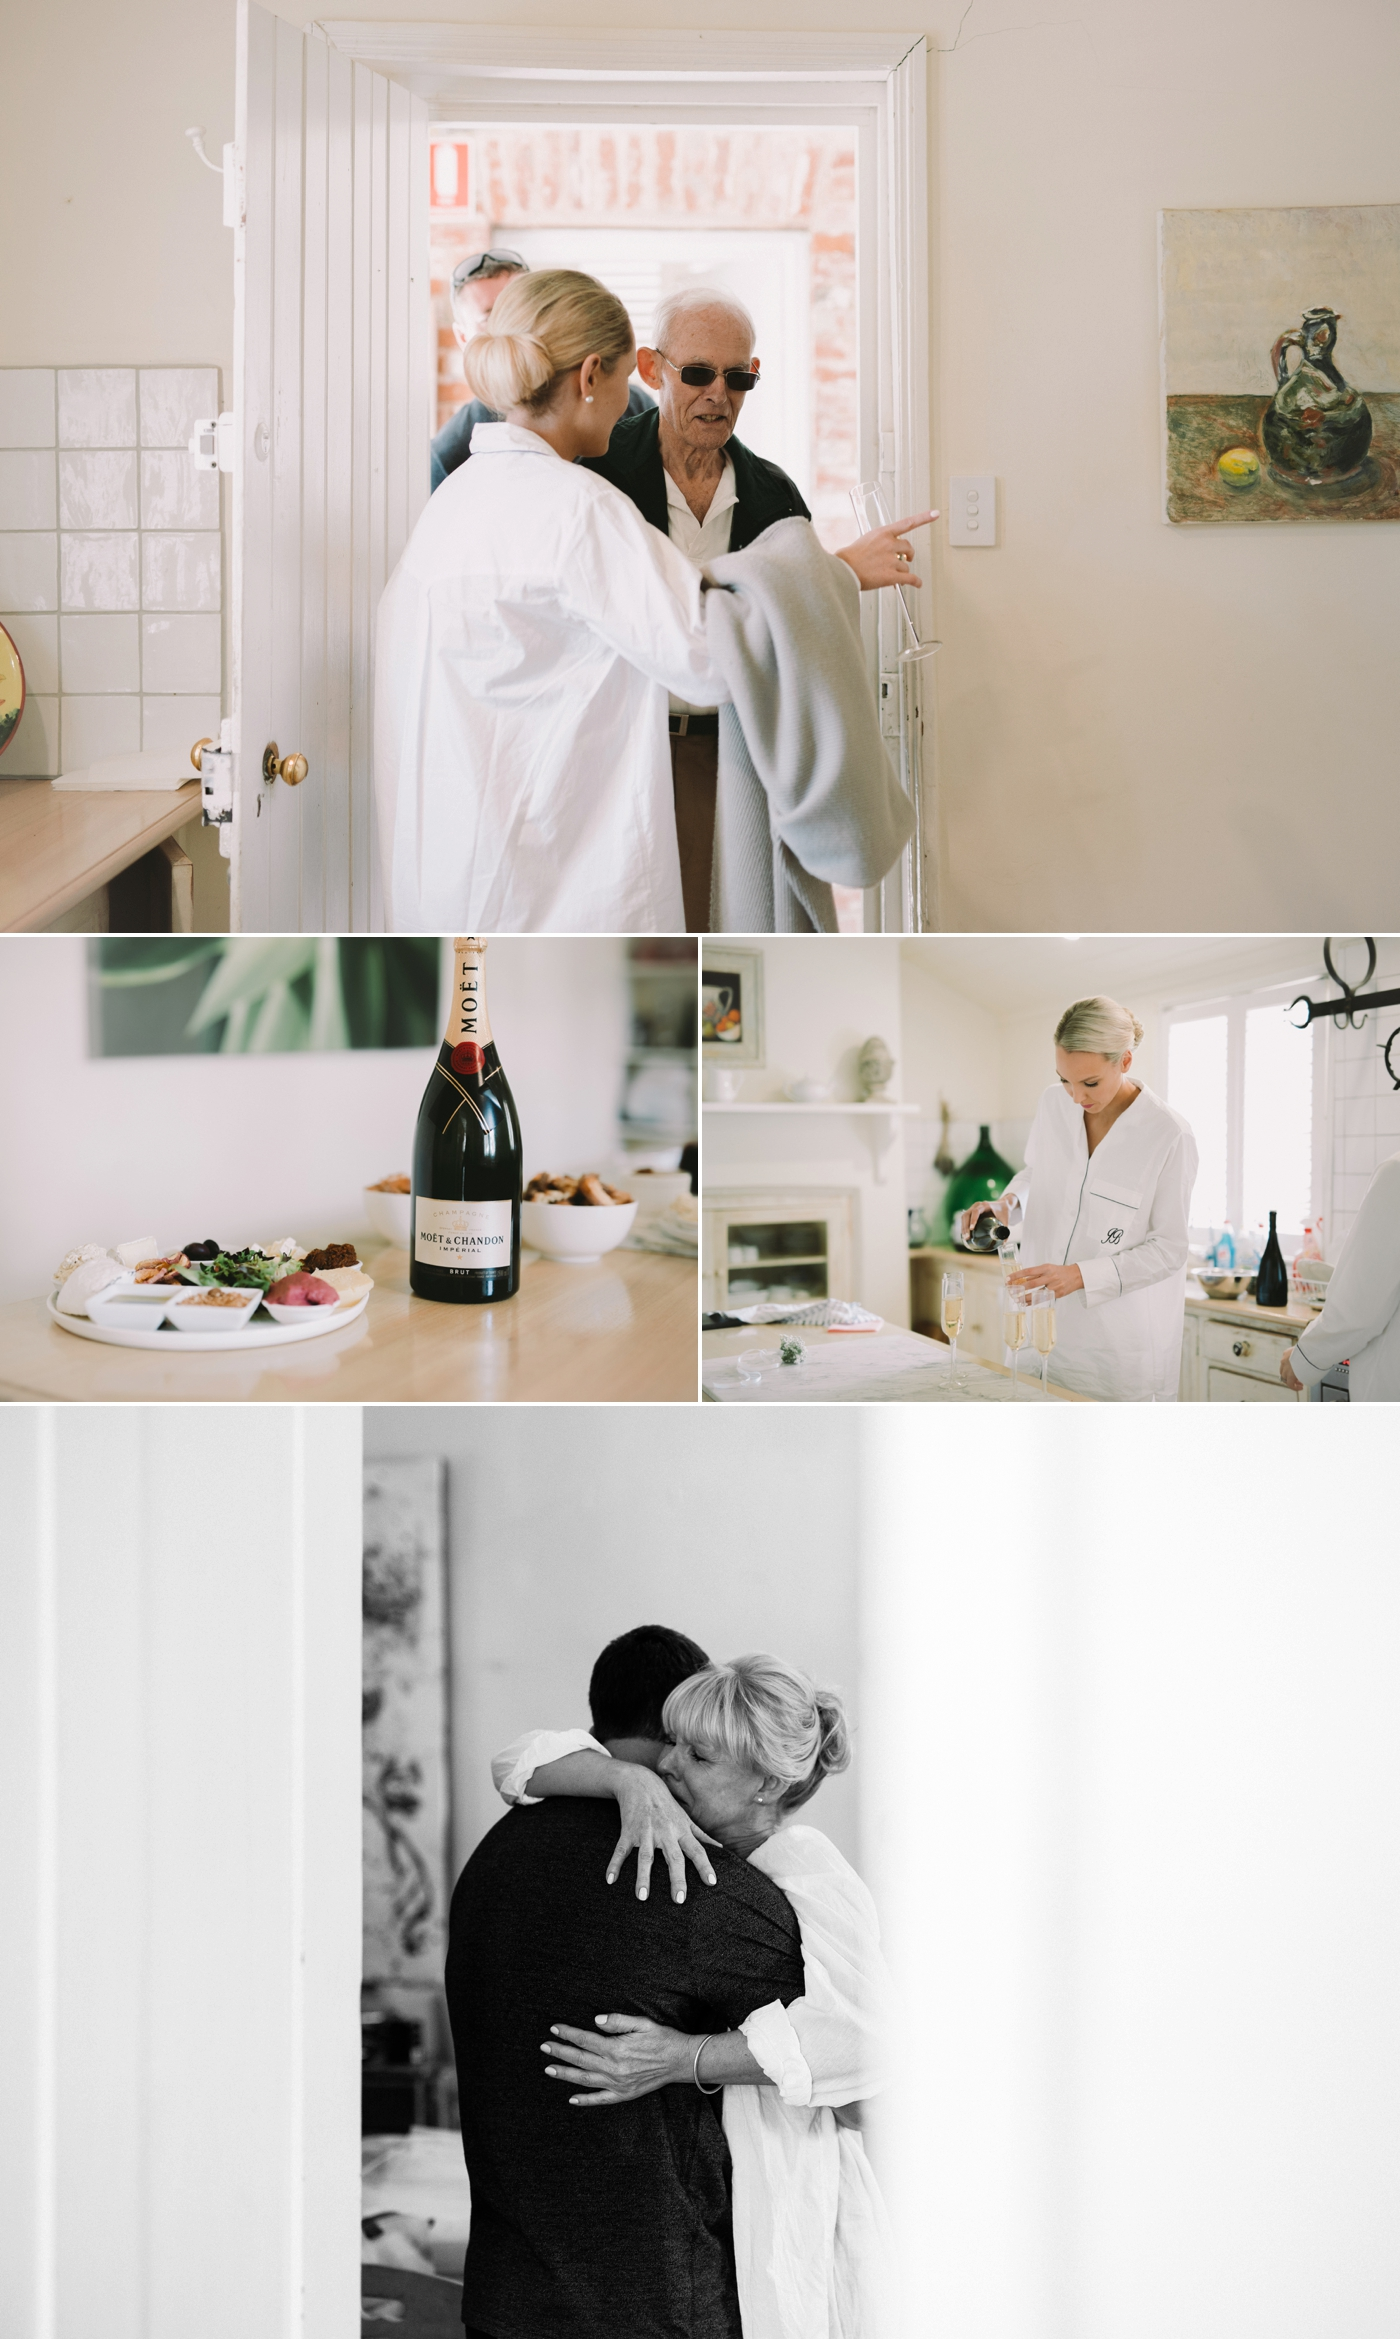 Bec & Brad - Waverley Estate Wedding - Natural Wedding Photographer in Adelaide - www.katherineschultzphotography.com 7